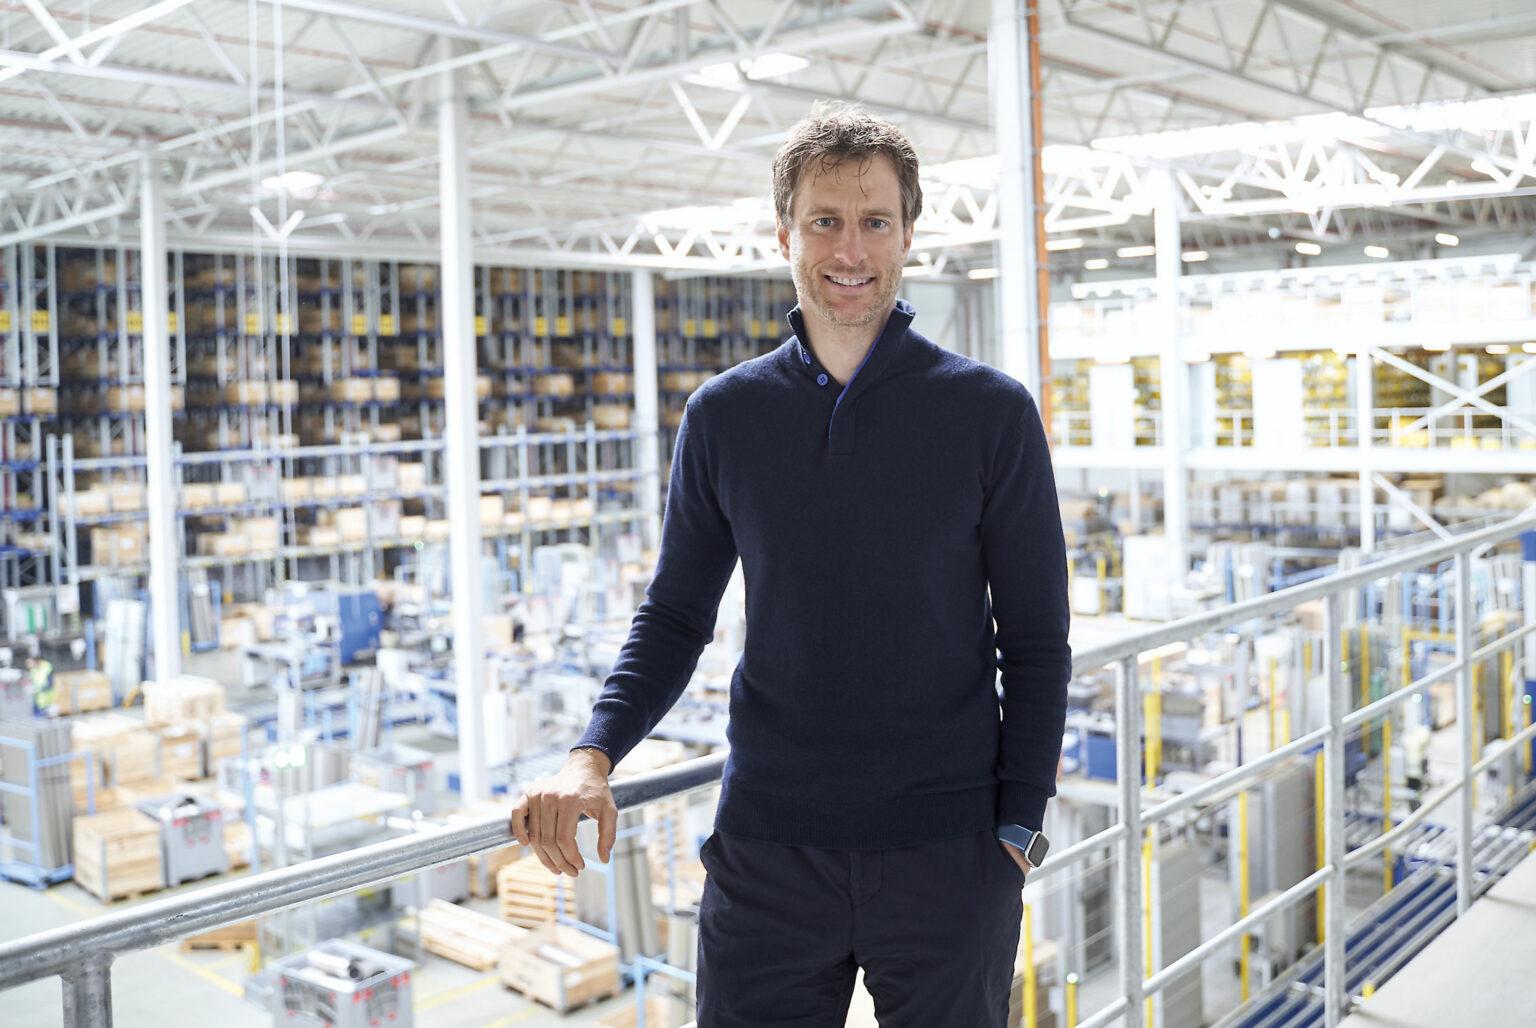 Patrick Jacob, Fr. Jacob Söhne GmbH & Co. KG